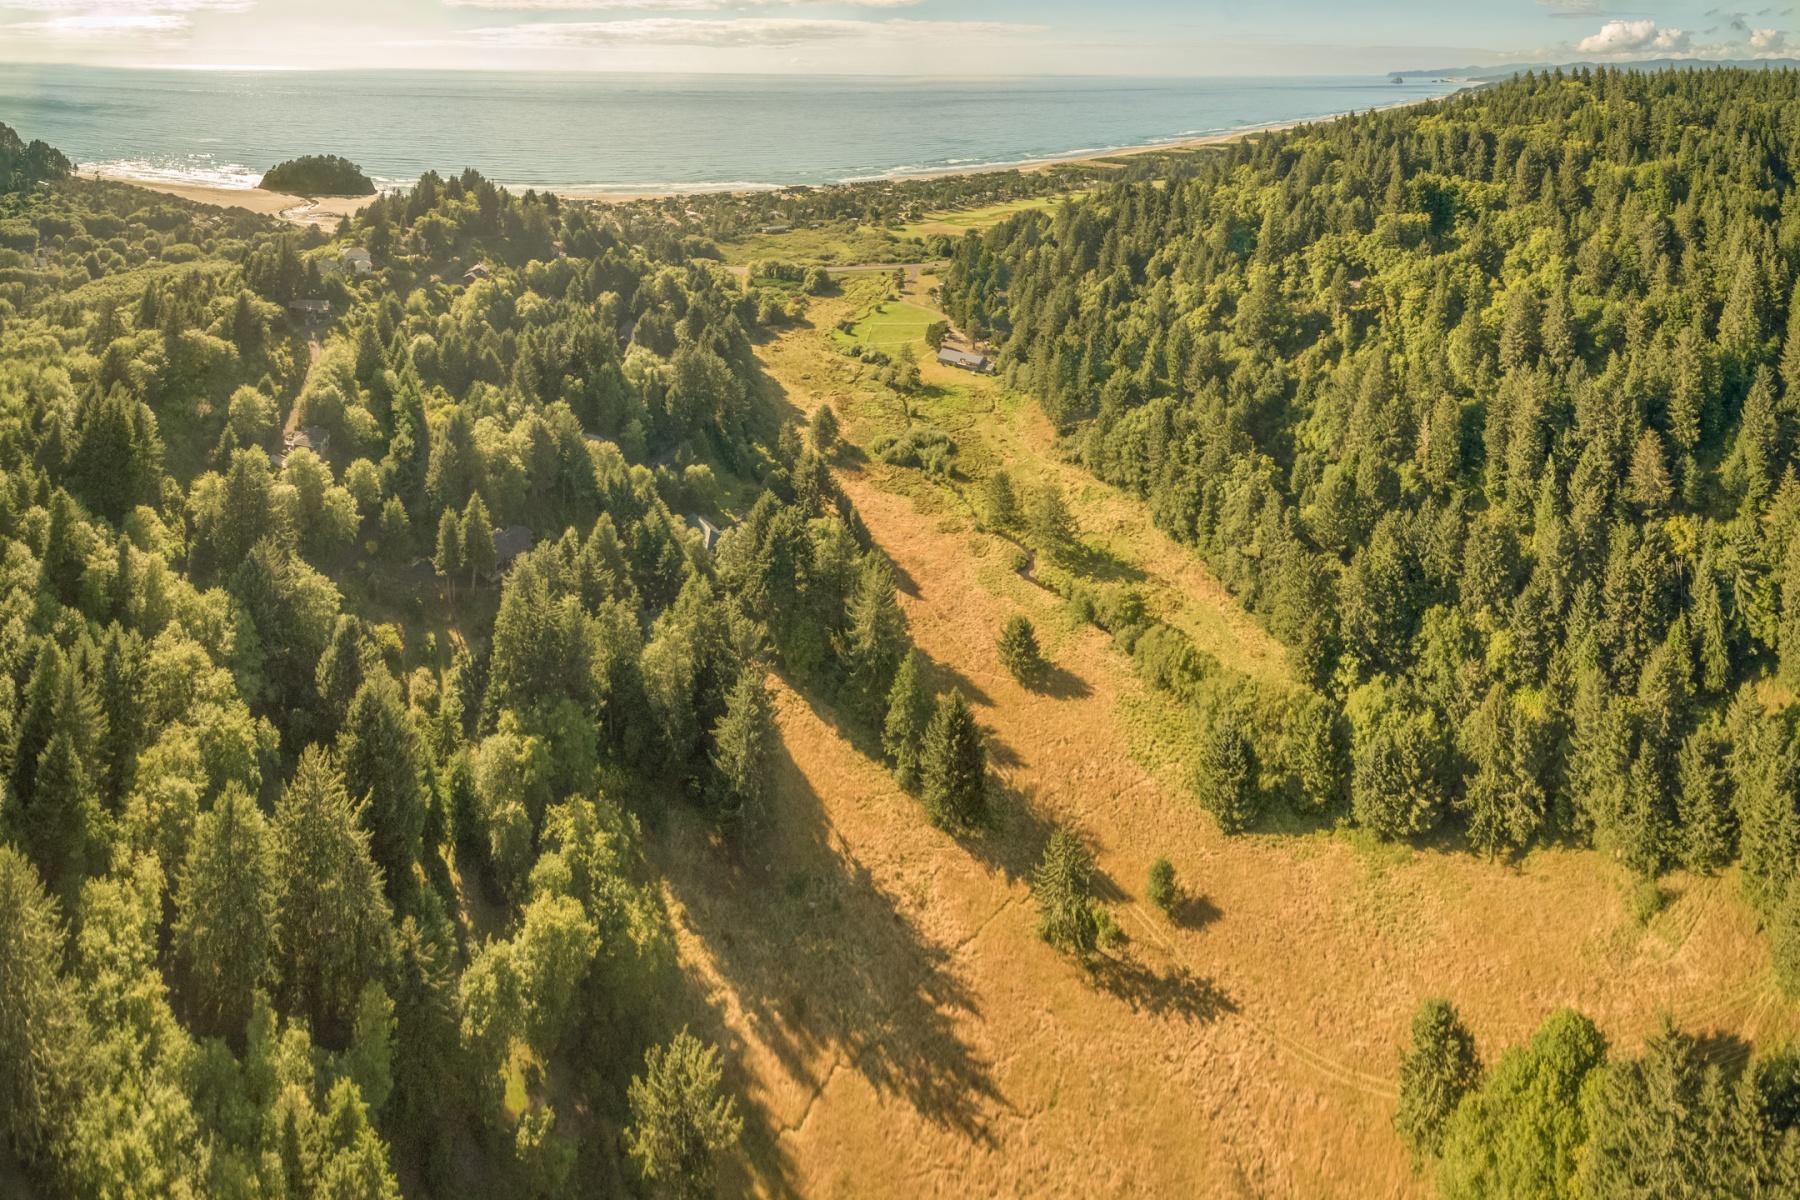 Land for Sale at 0 SCHOOLHOUSE RD, NESKOWIN Neskowin, Oregon, 97149 United States